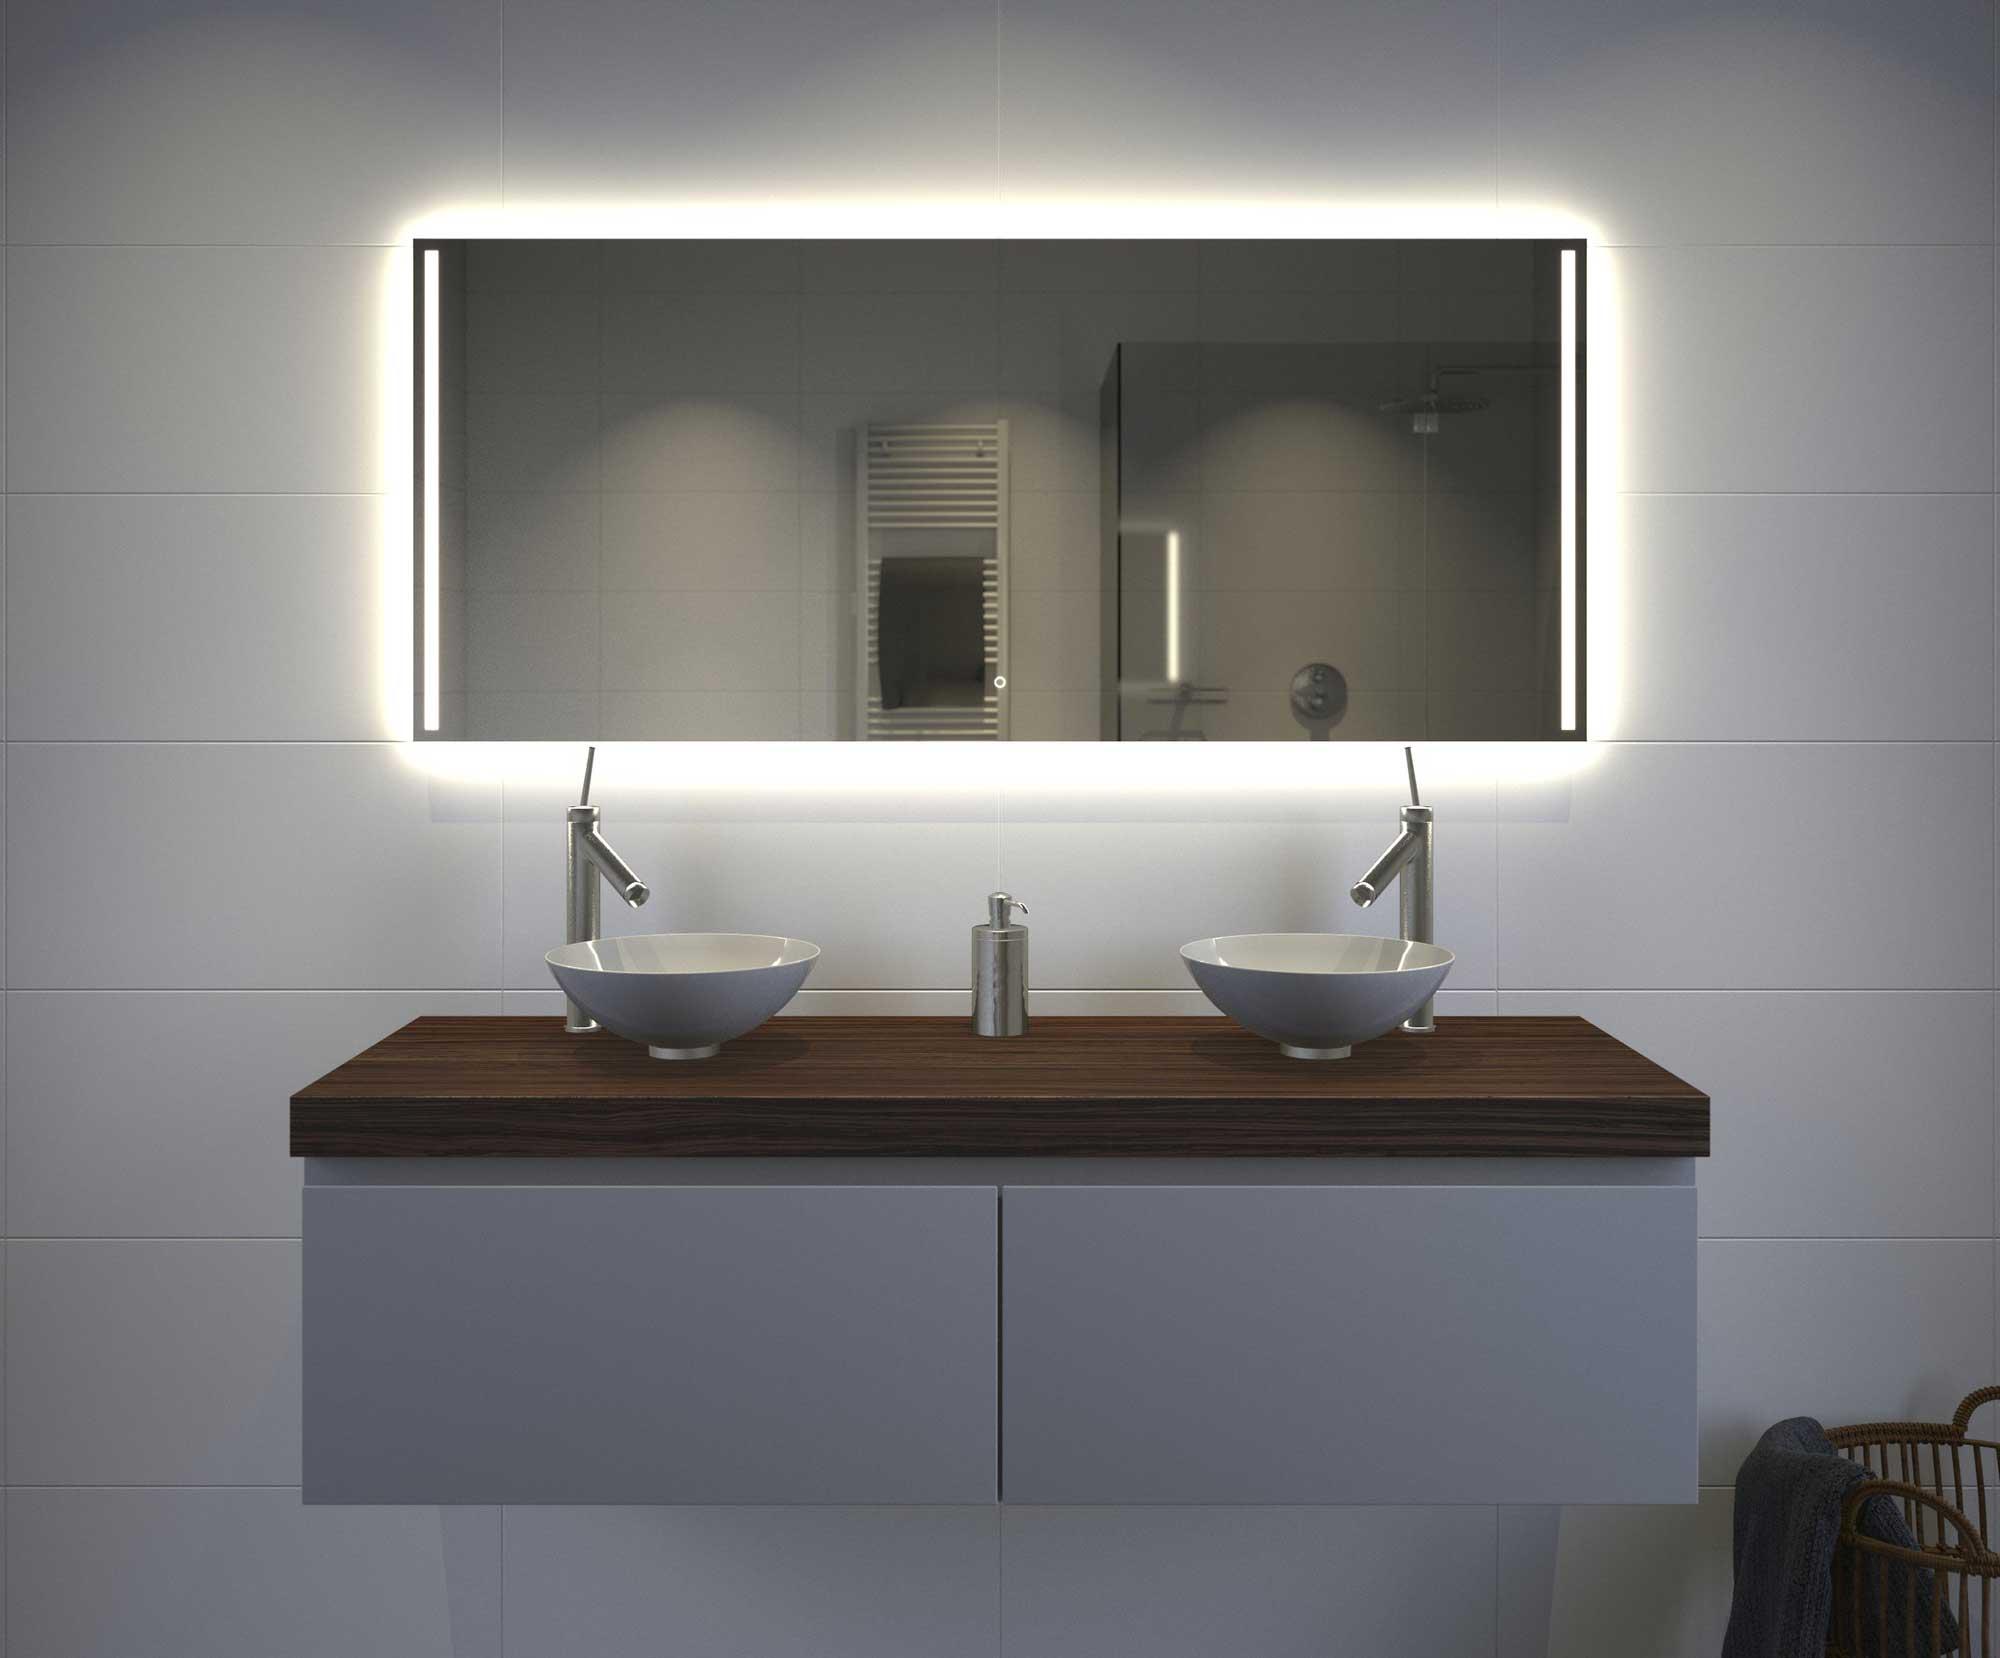 fraaie badkamer spiegel met verlichting spiegelverwarming en touch sensor 140x60 cm designspiegels. Black Bedroom Furniture Sets. Home Design Ideas